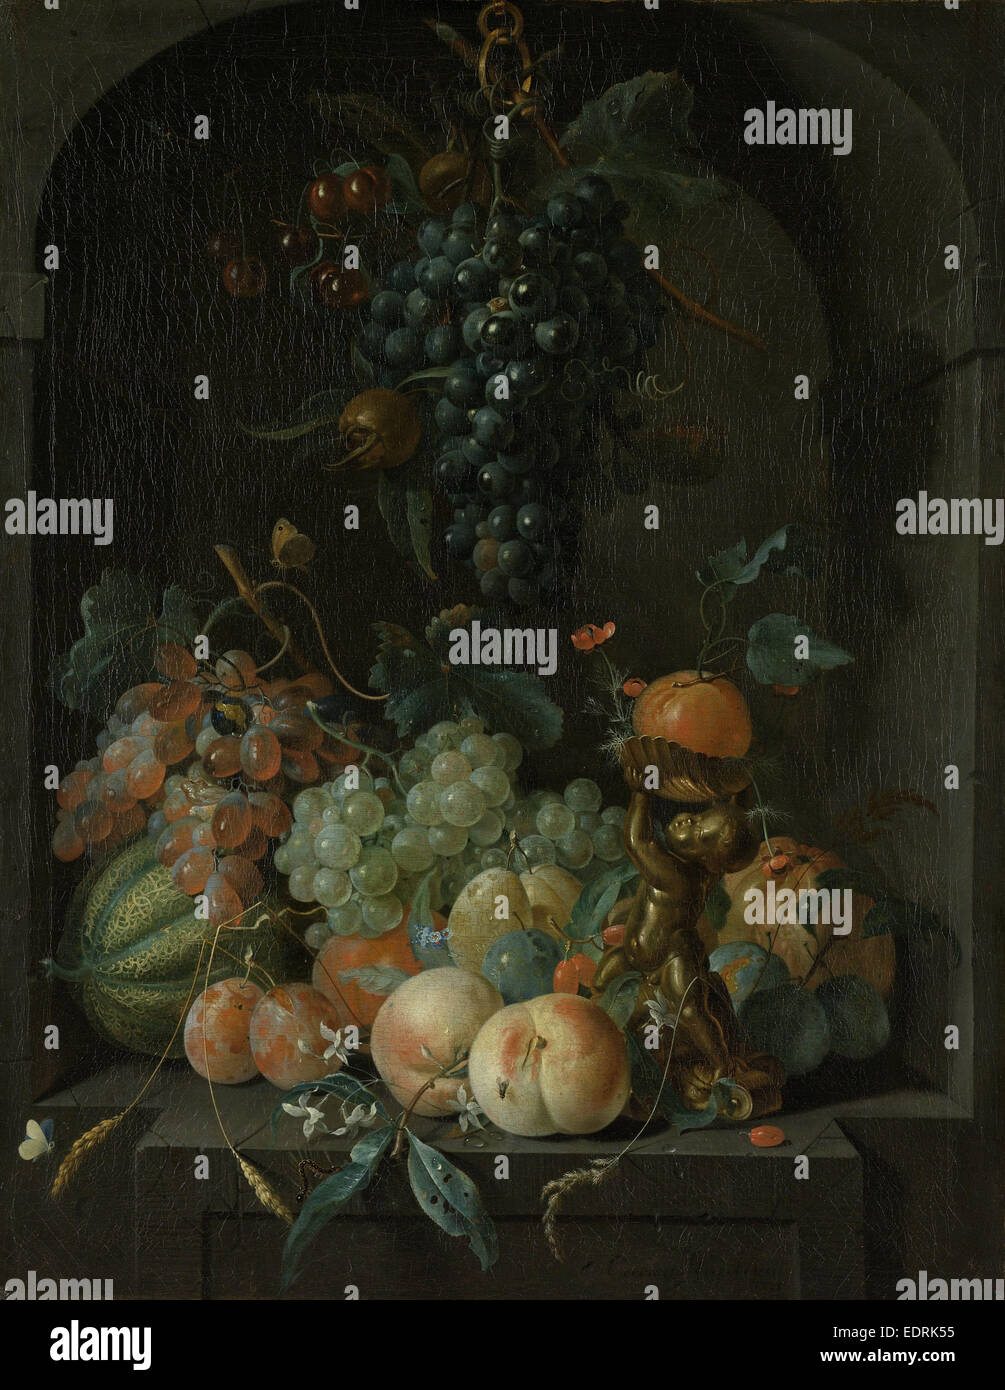 Nature morte avec fruits, Coenraet Roepel, 1721 Photo Stock